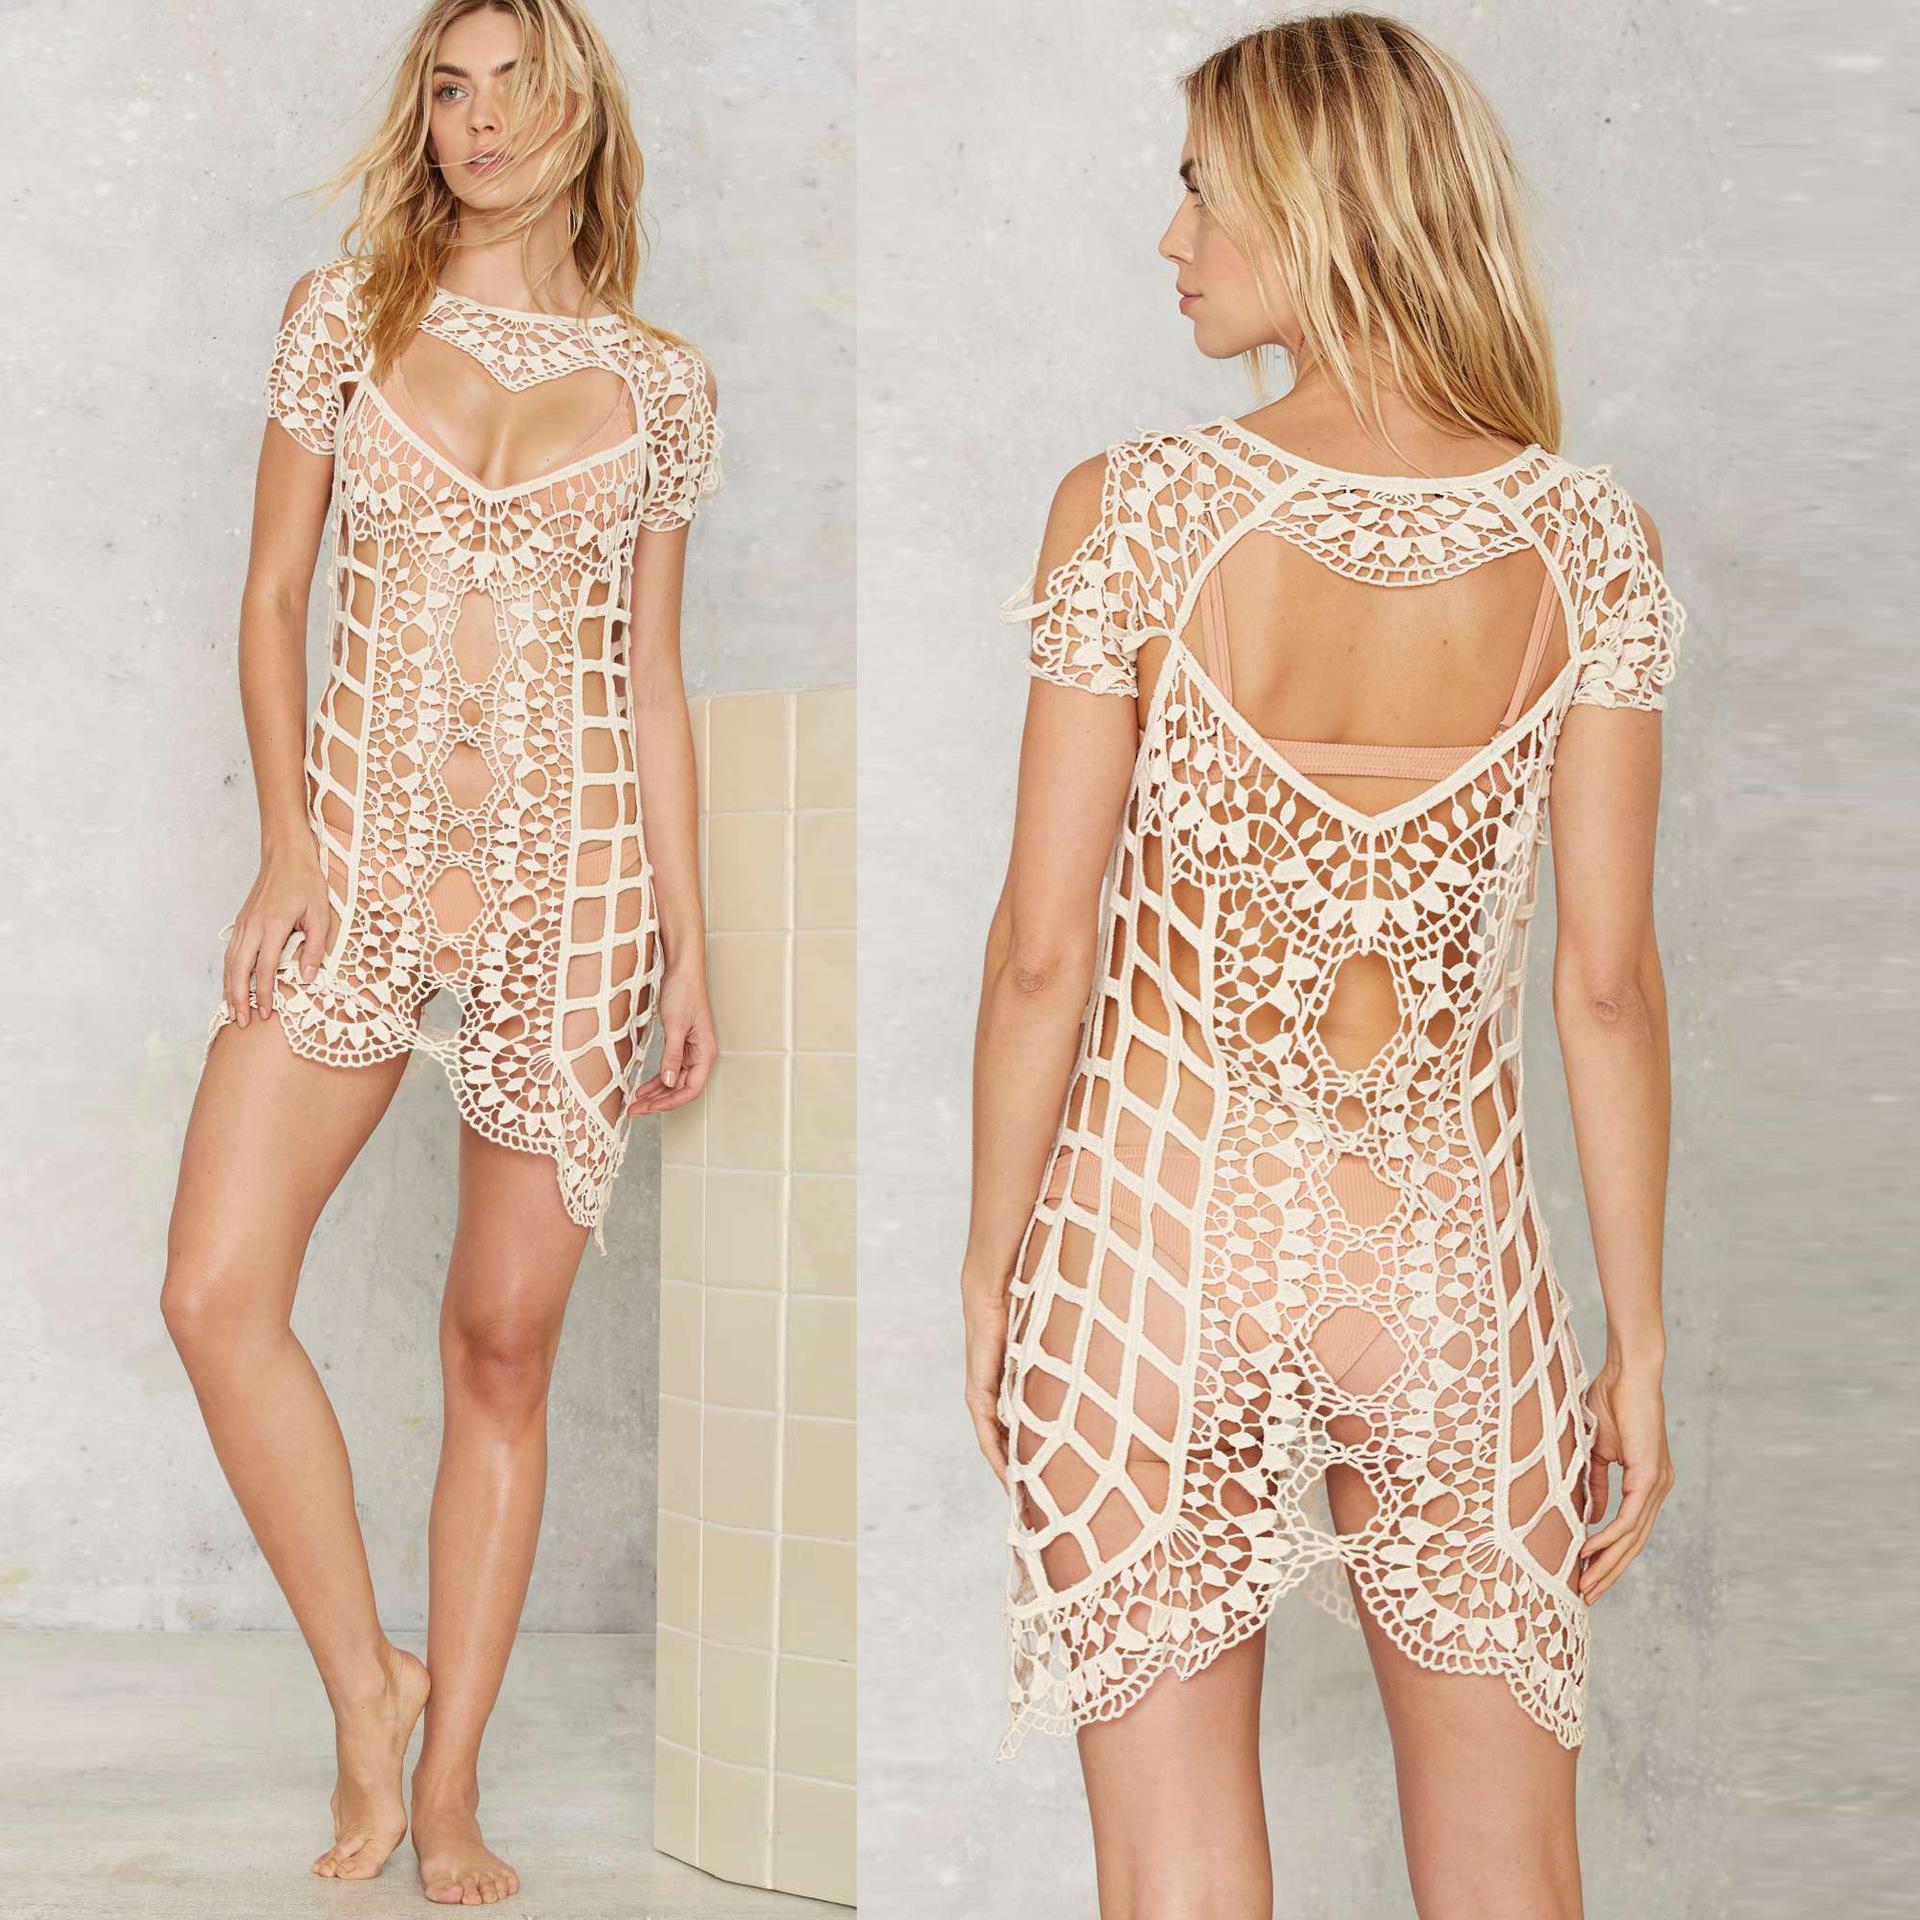 Großhandel Cocktailkleider Sexy Elegant Womens Backless Sequin Kleid ...